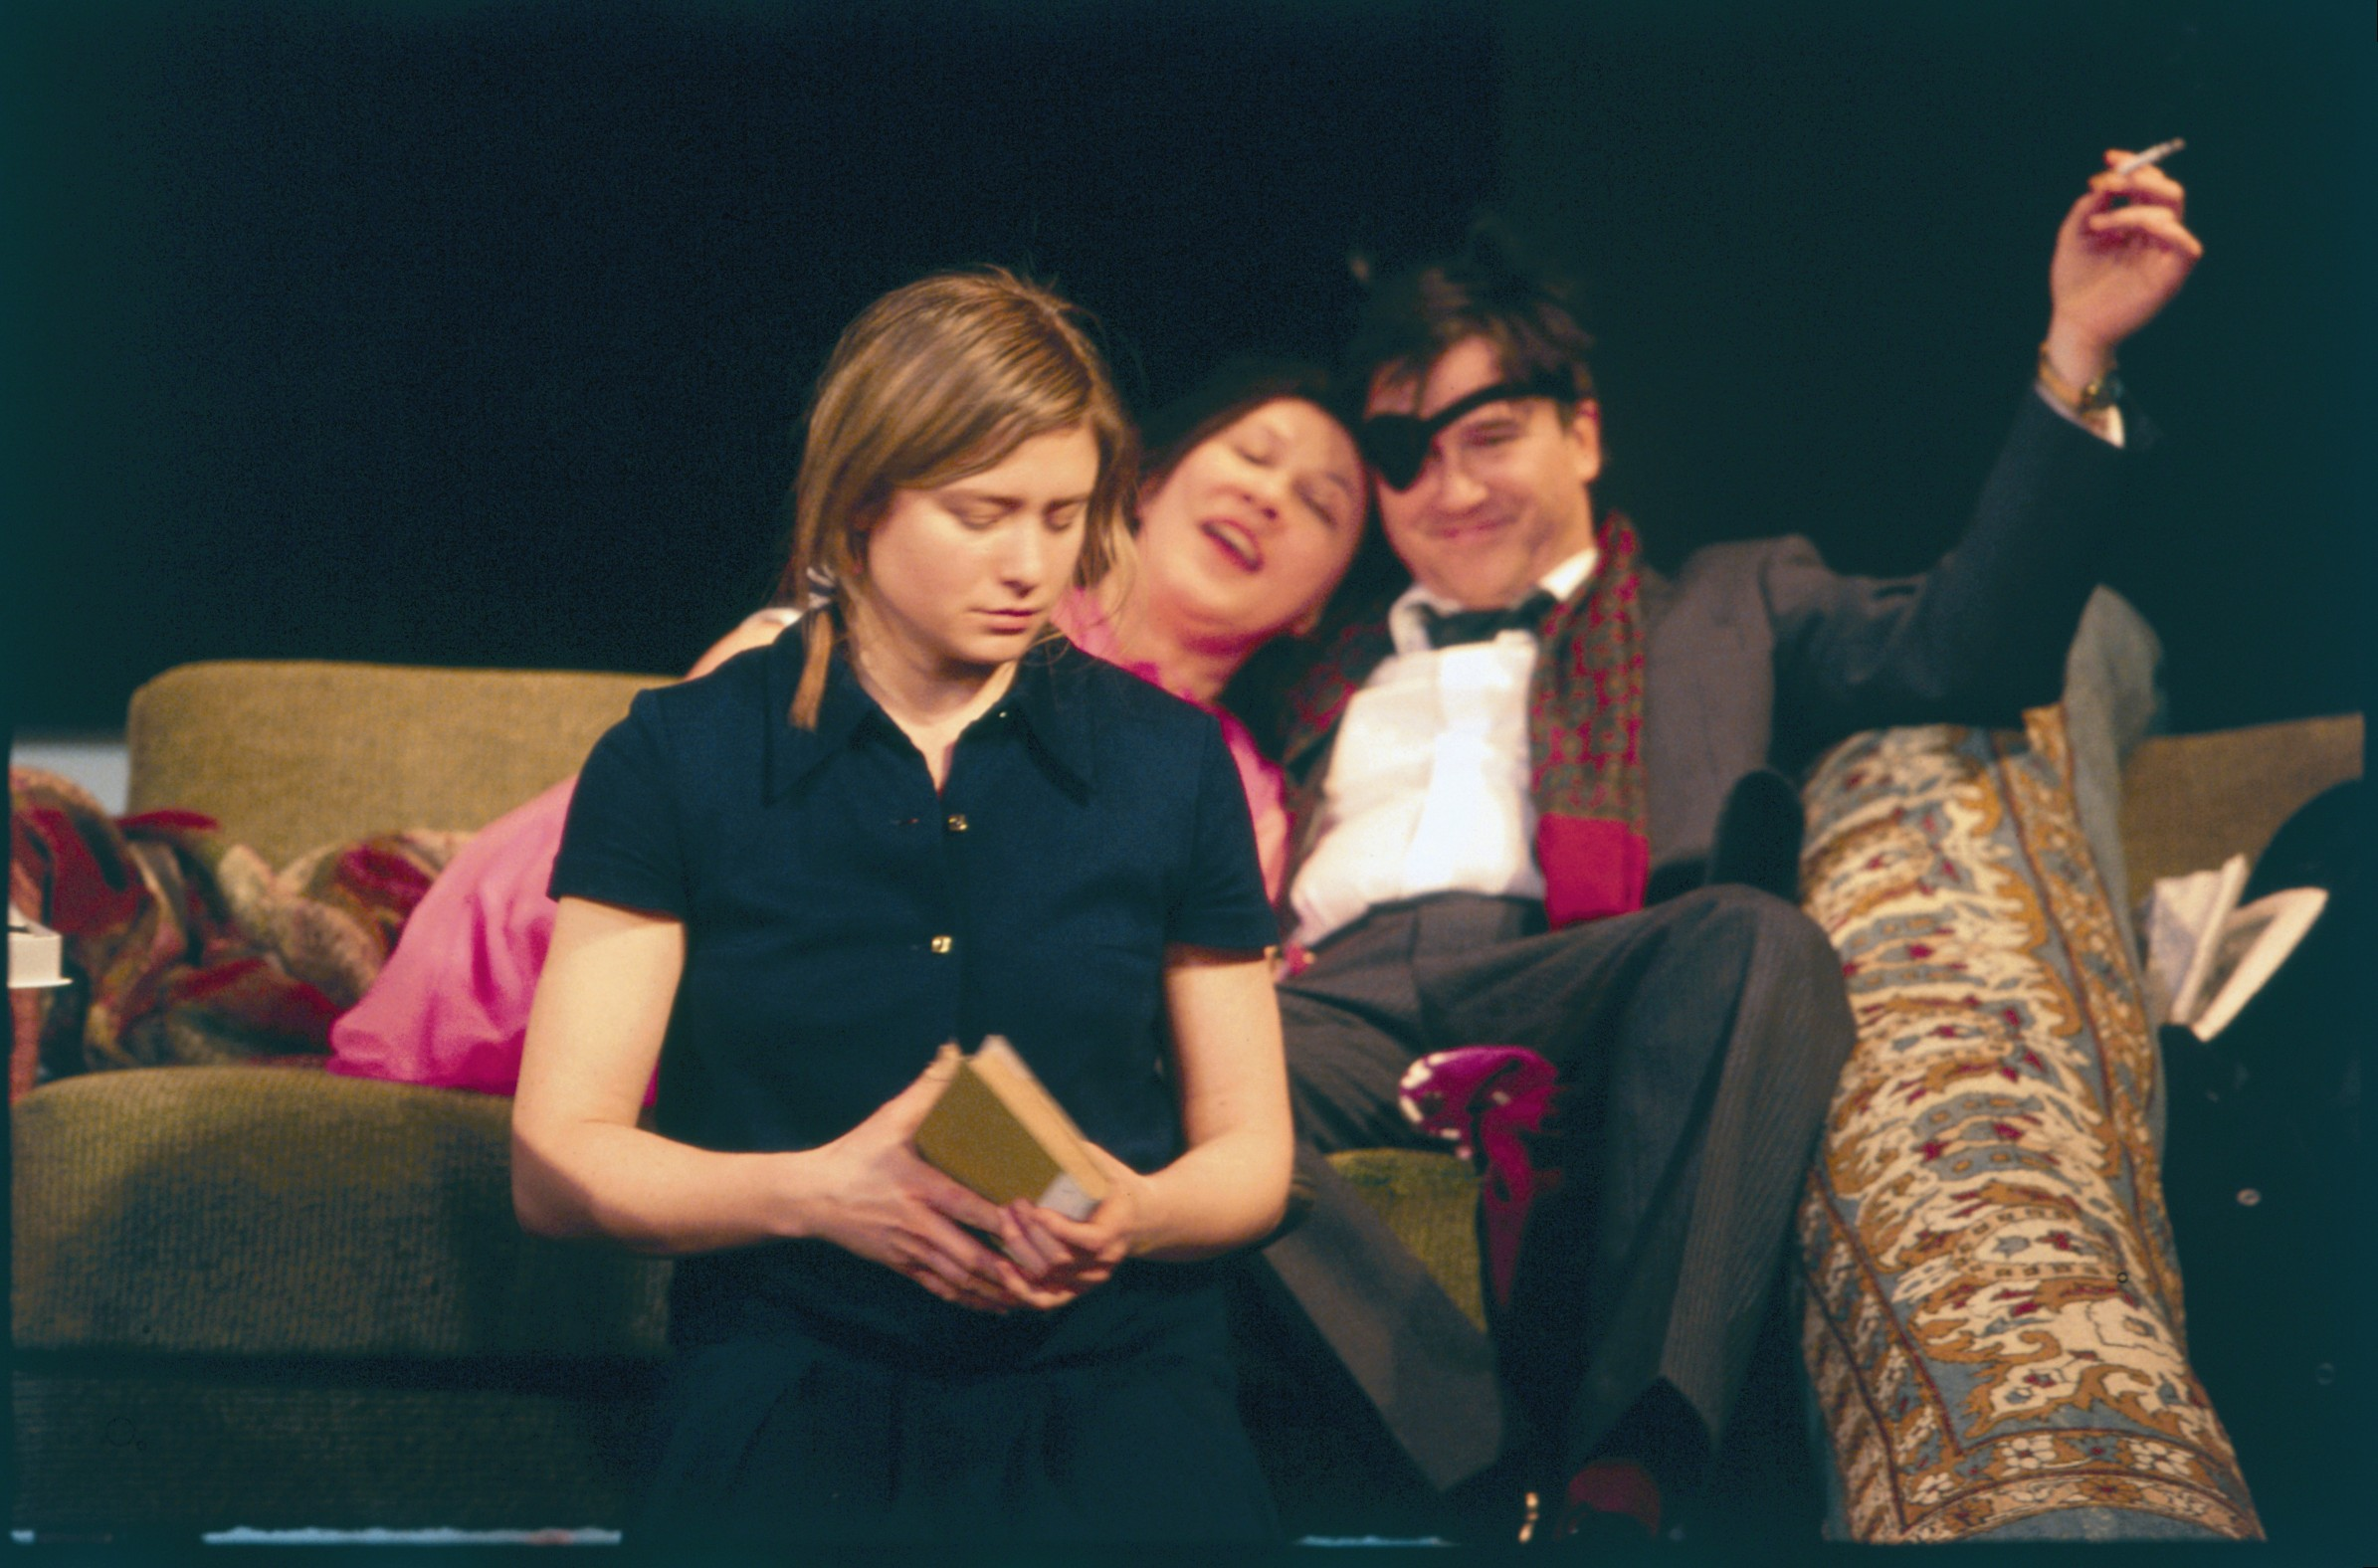 Der bittere Honig - Julia Jentsch, Eva Mattes, Uwe Bohm - © St. Pauli Theater